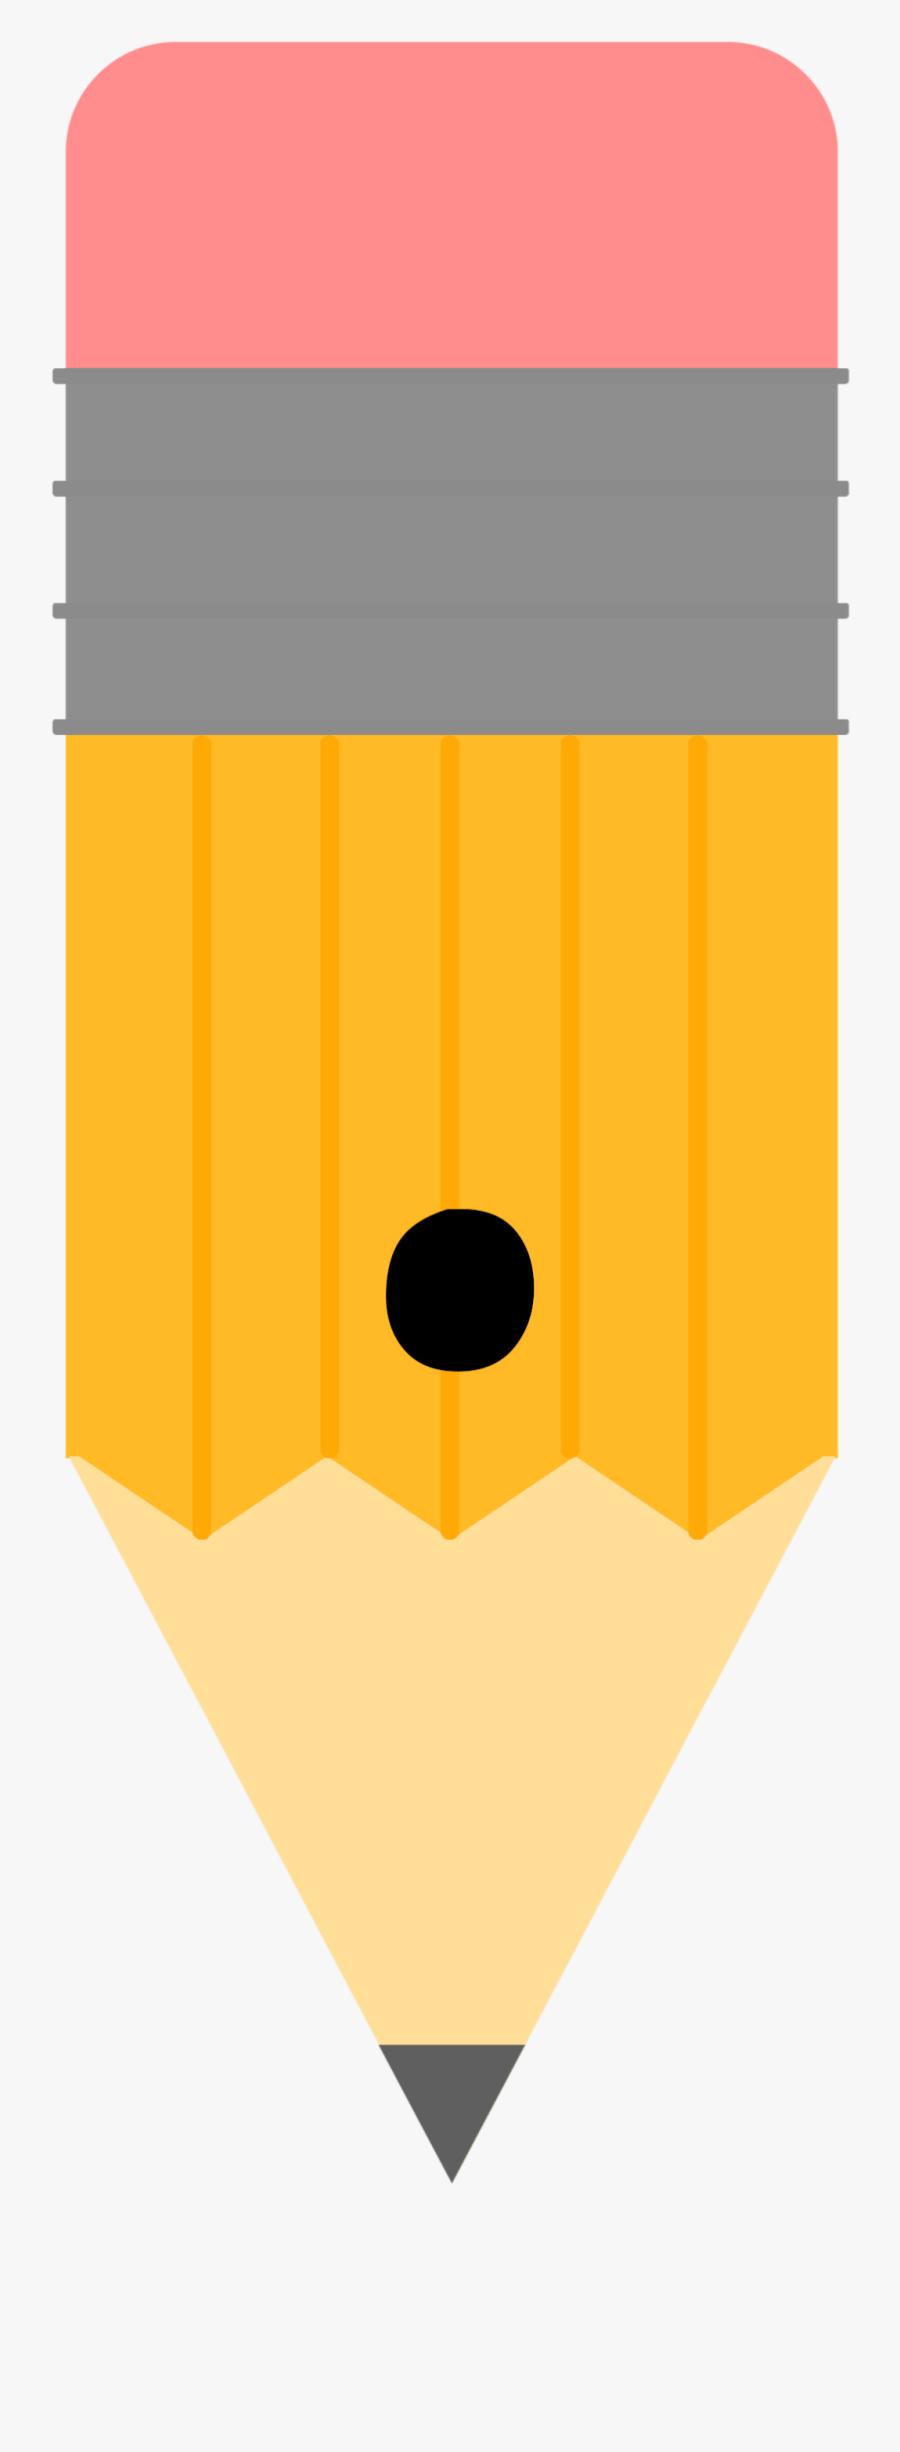 Pencil Clipart Back To School - Pencil Back To School, Transparent Clipart